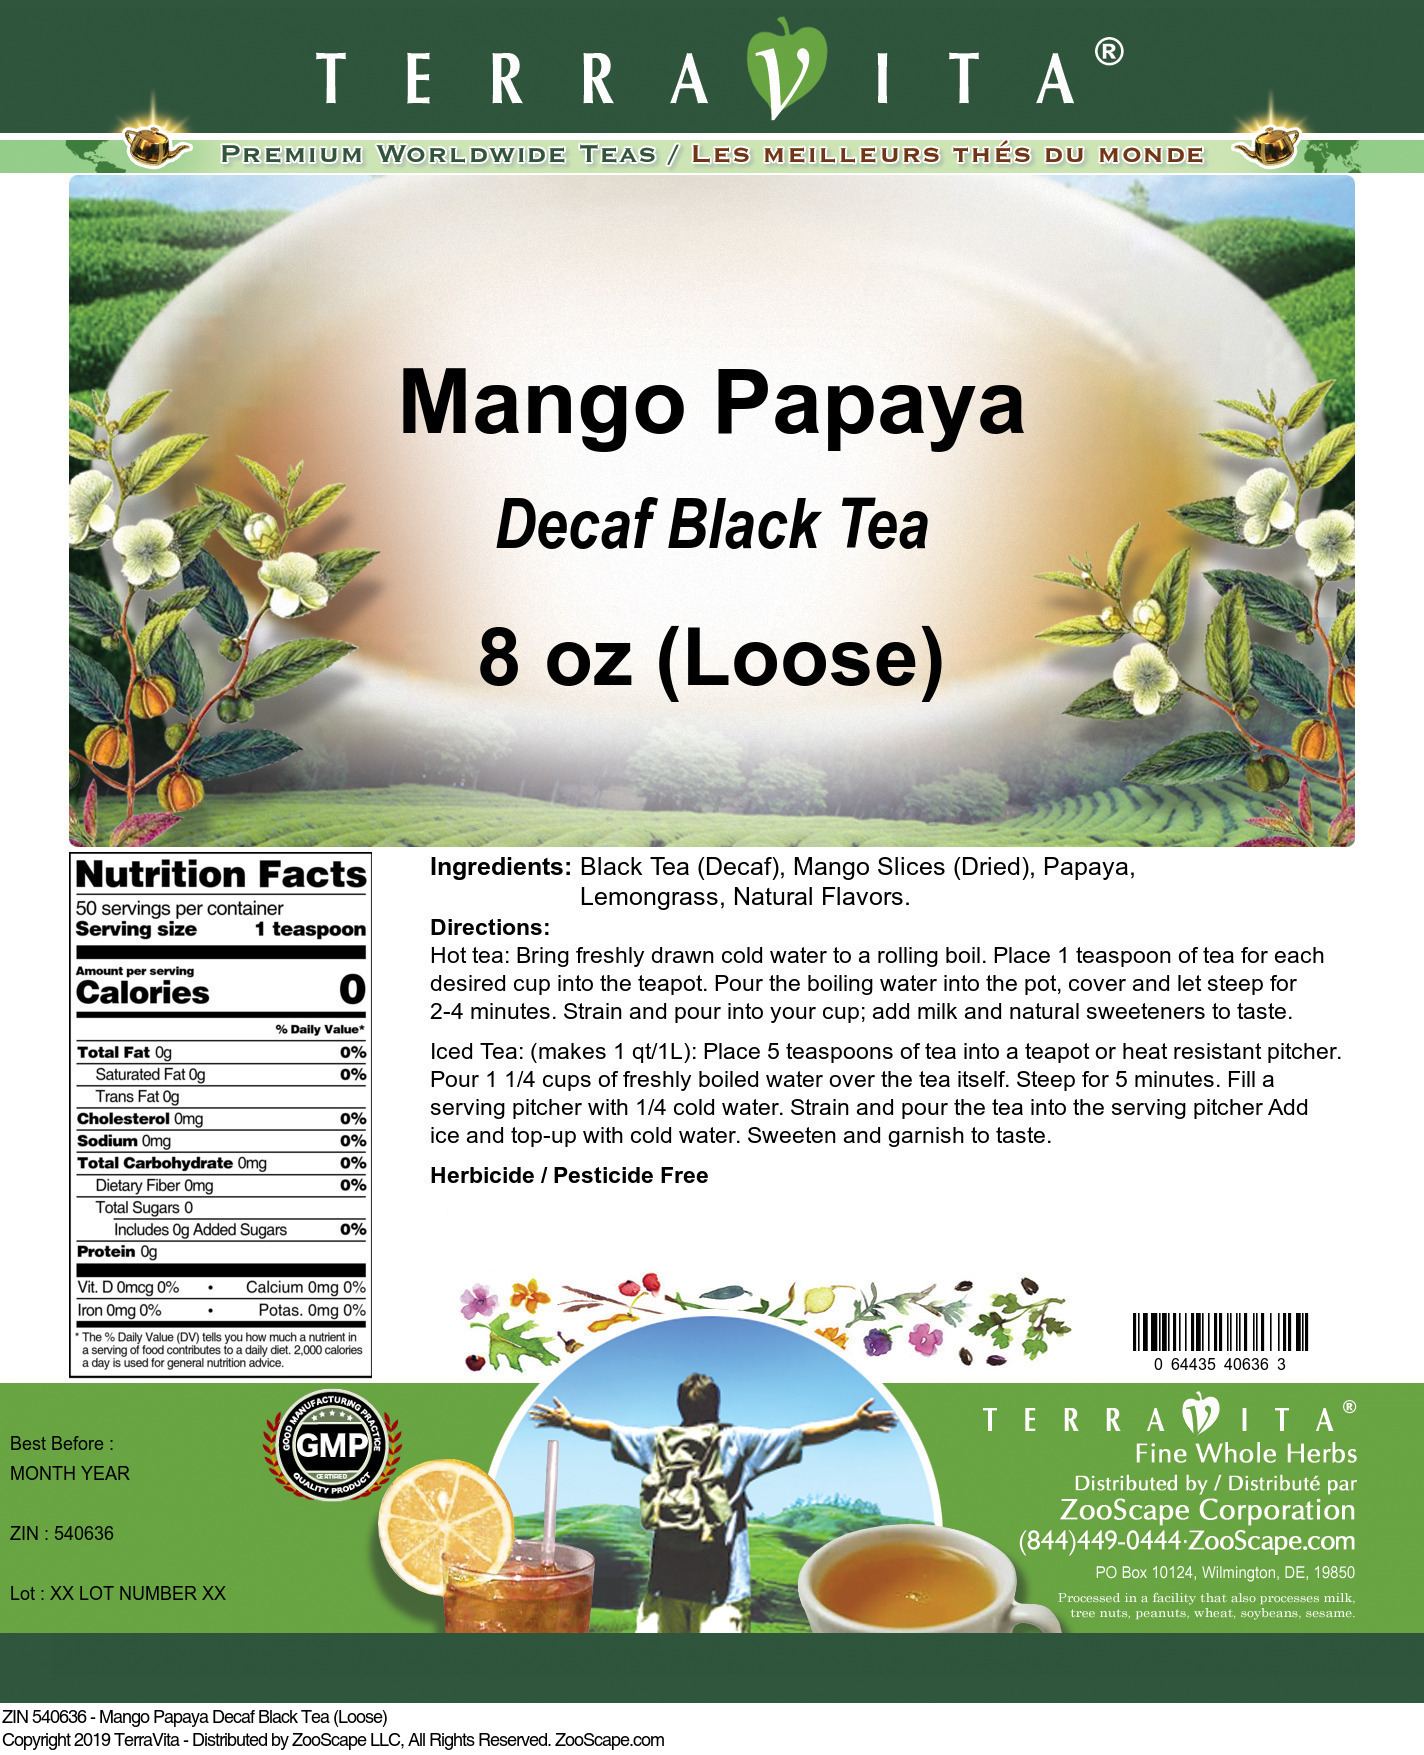 Mango Papaya Decaf Black Tea